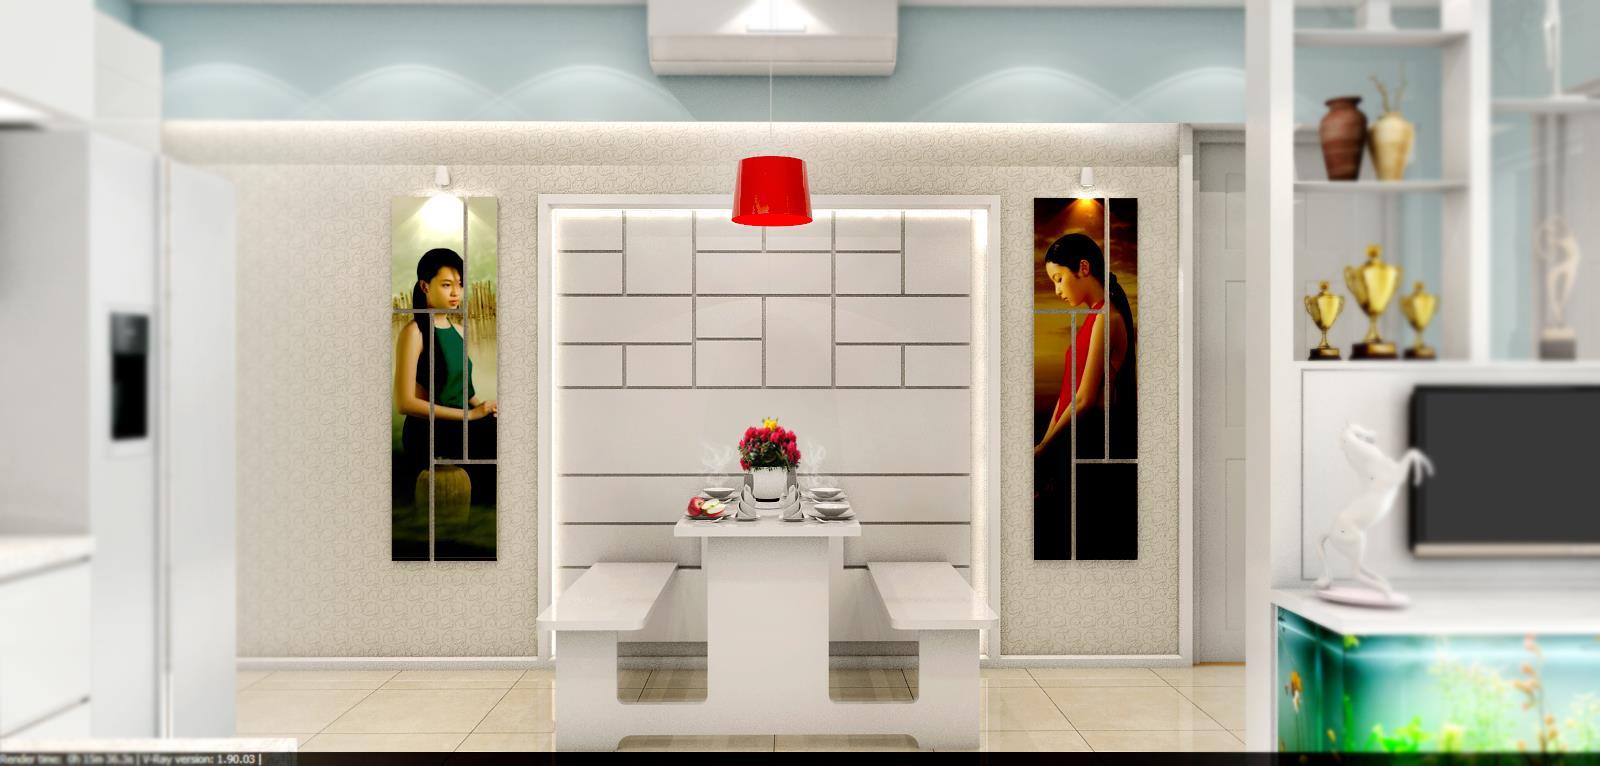 Free sketchup 3d model living room, kitchen & dining area #29